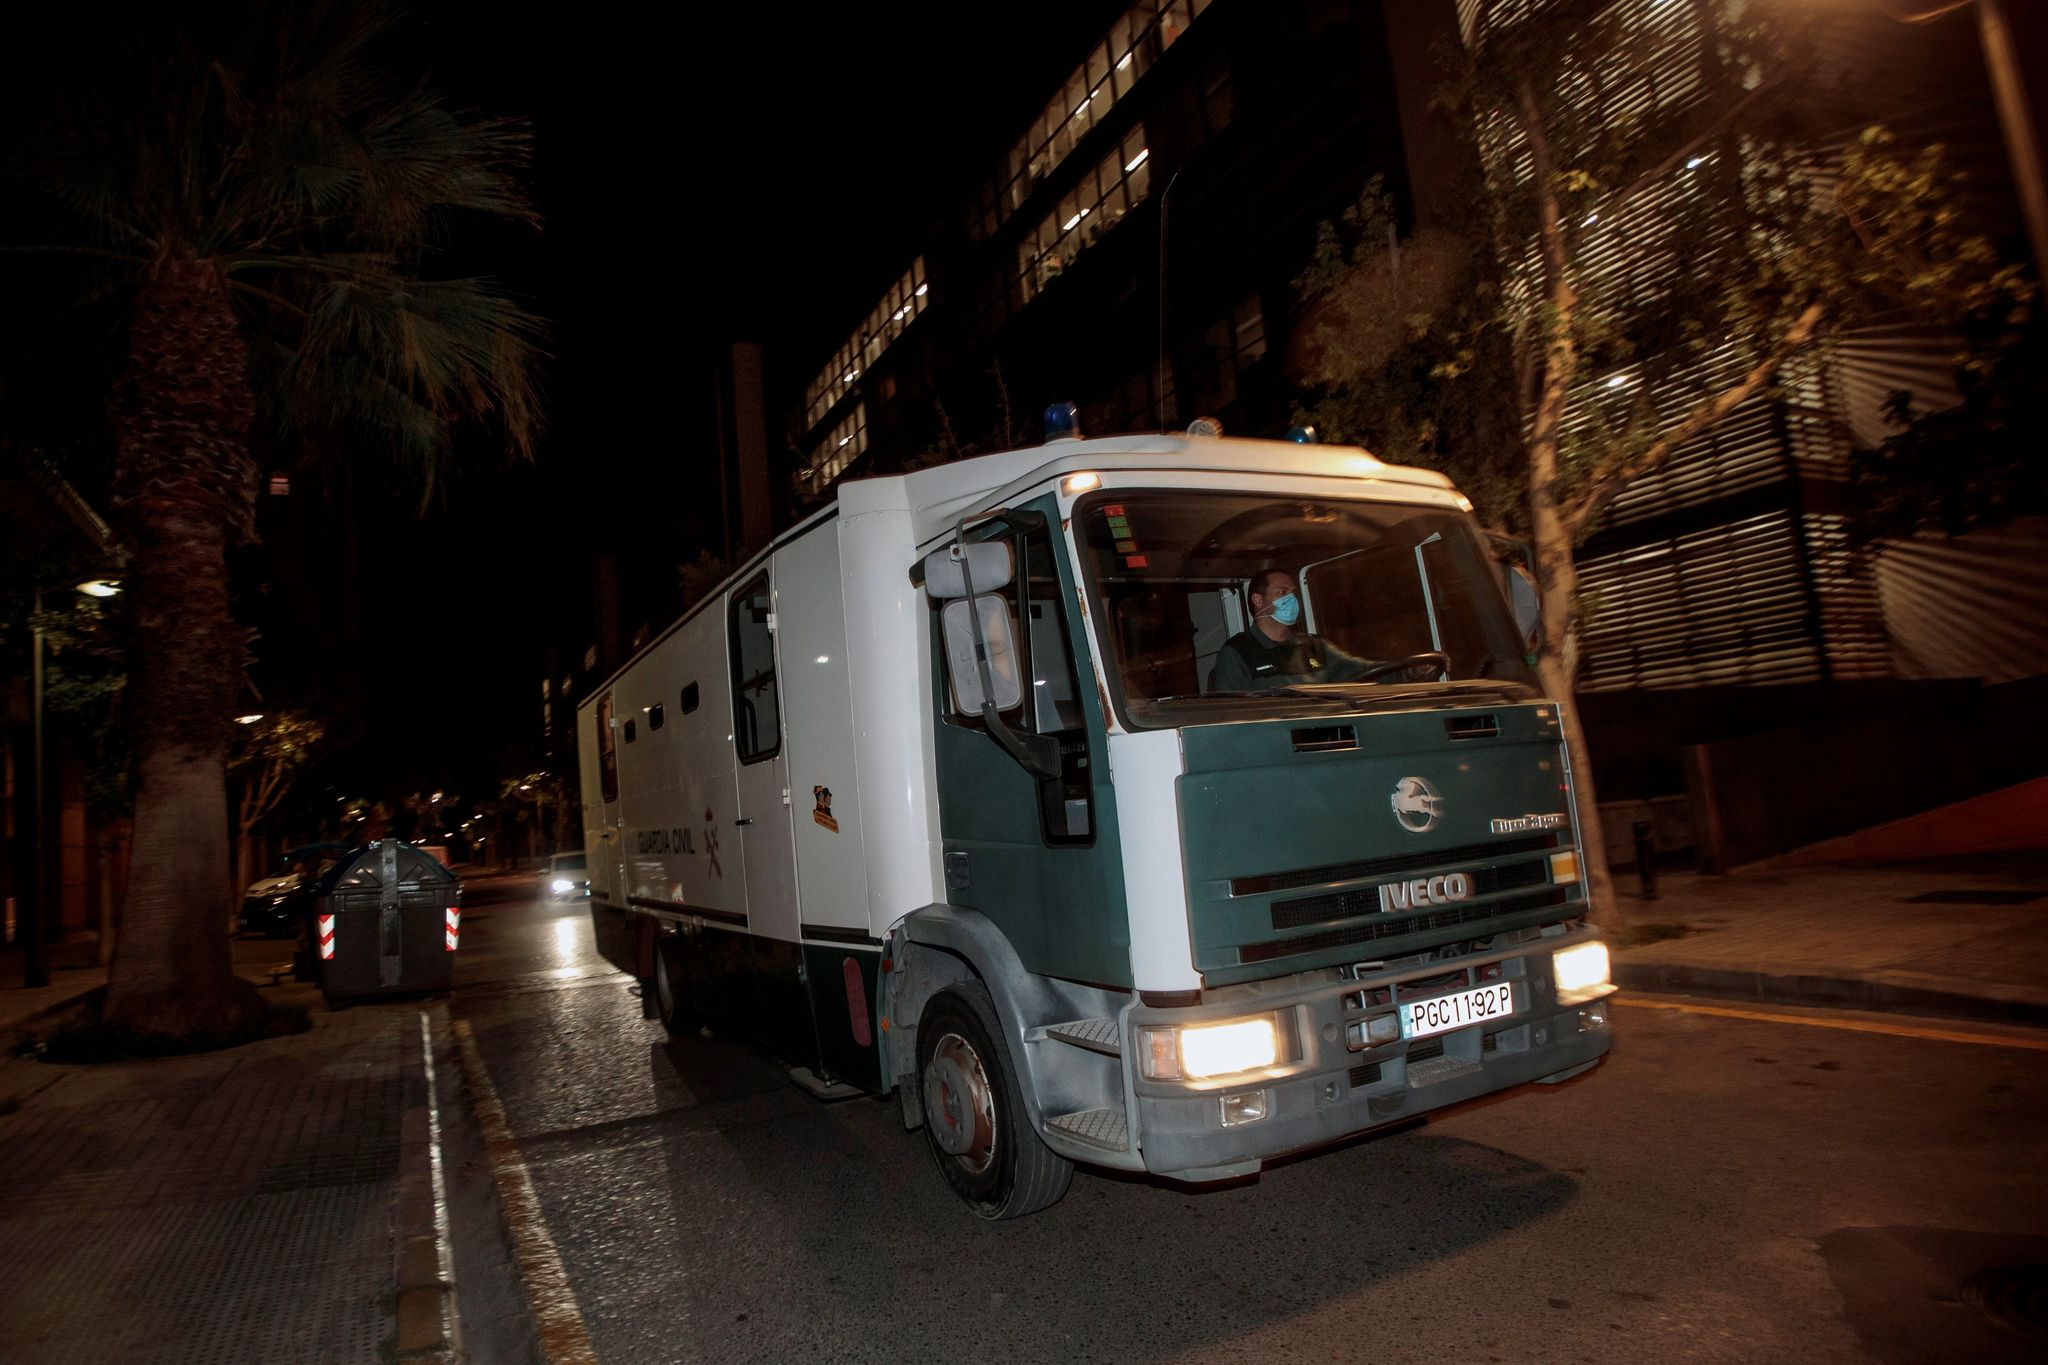 El furgón de la Guardia Civil que trasladó a los investigados a la cárcel.